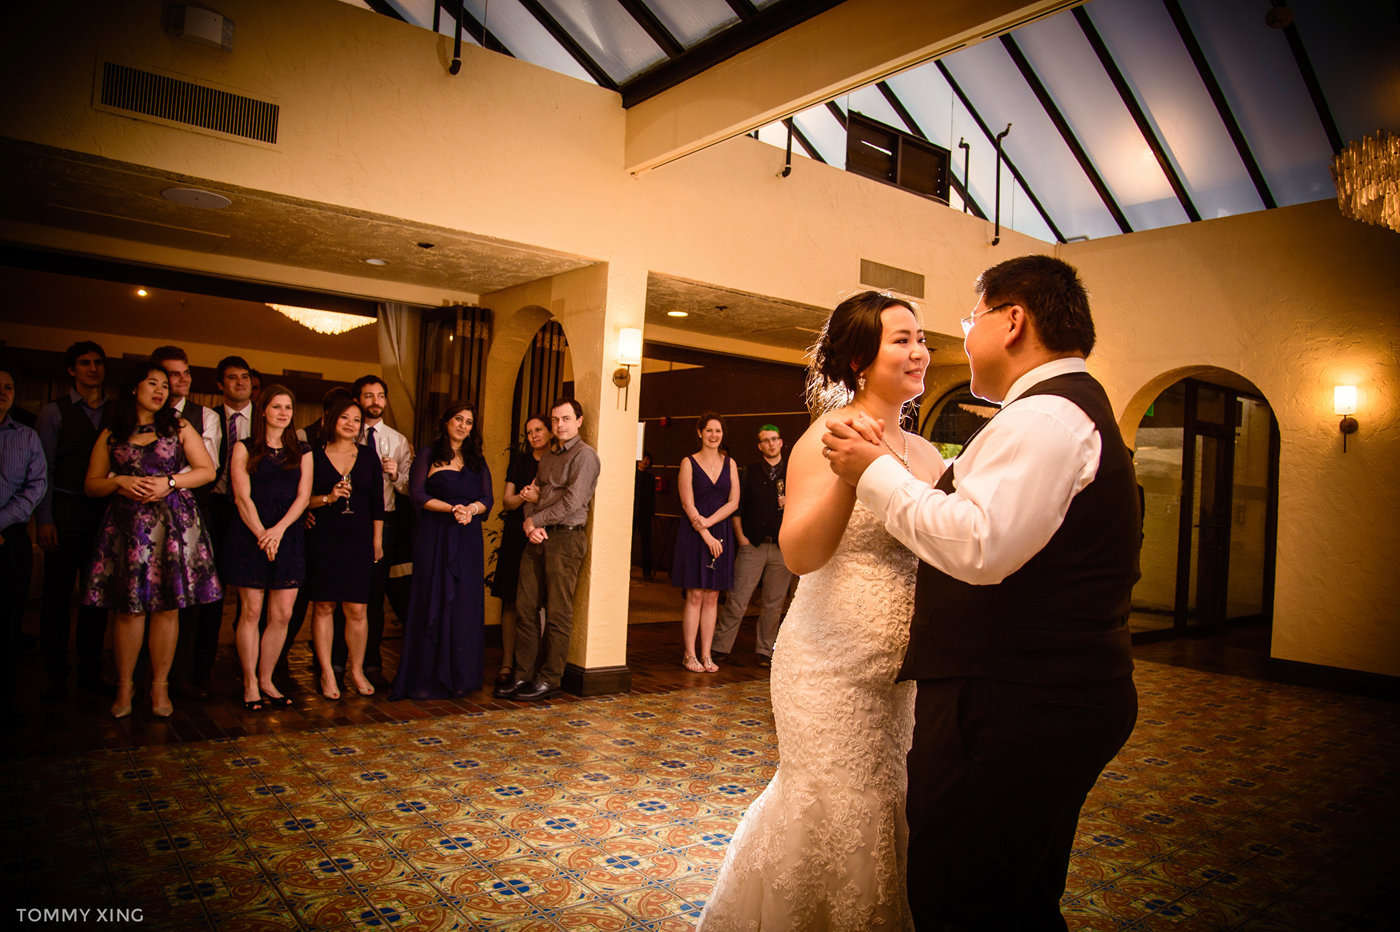 STANFORD MEMORIAL CHURCH WEDDING - Wenjie & Chengcheng - SAN FRANCISCO BAY AREA 斯坦福教堂婚礼跟拍 - 洛杉矶婚礼婚纱照摄影师 Tommy Xing Photography252.jpg